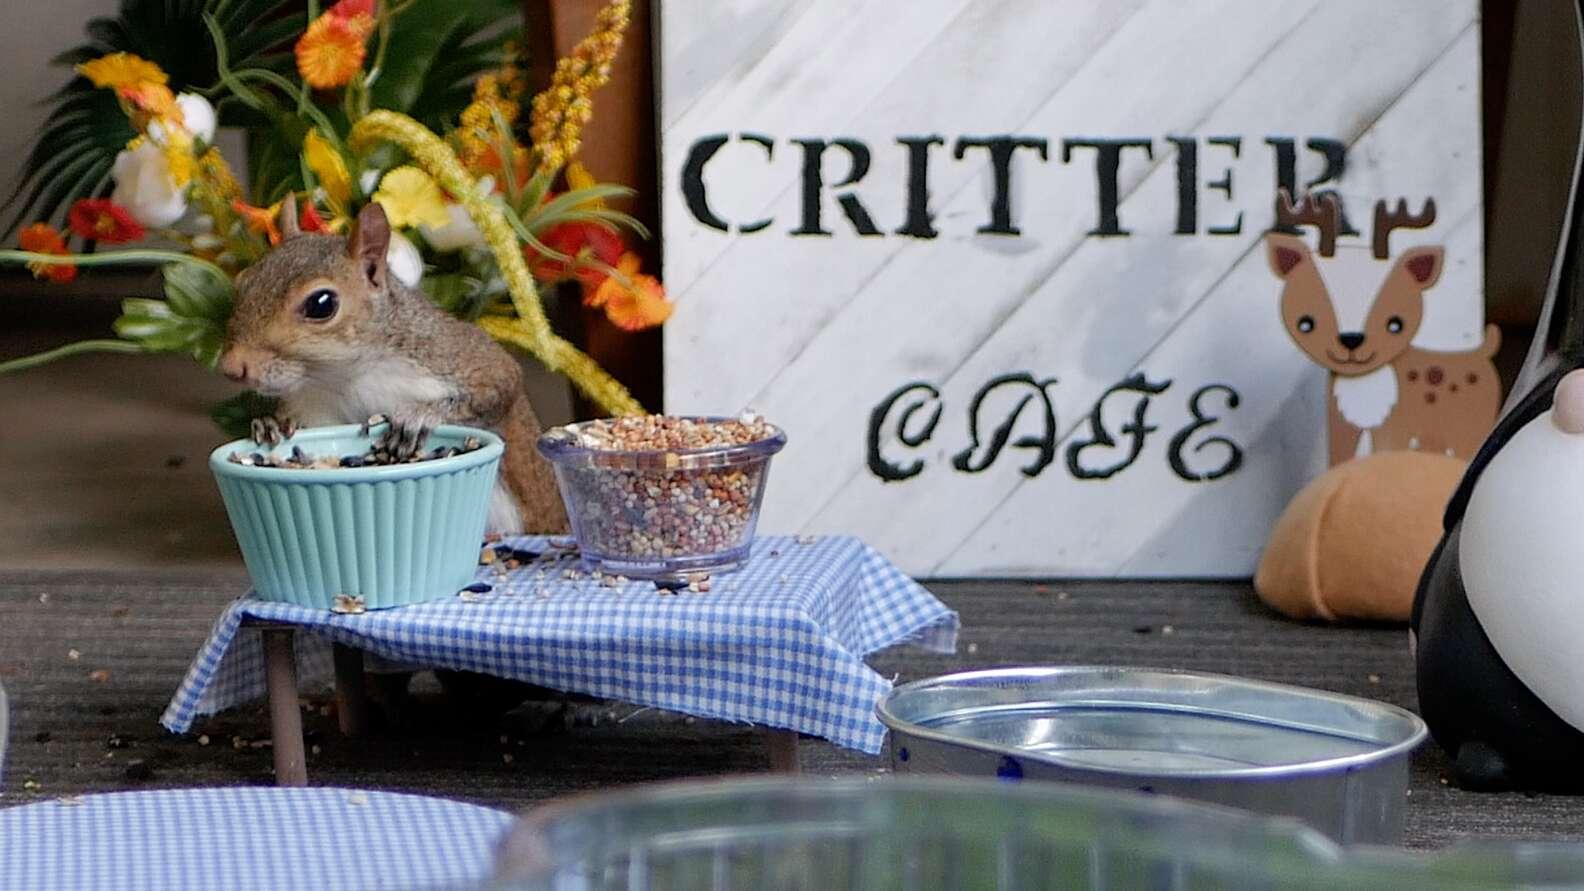 Critter Cafe